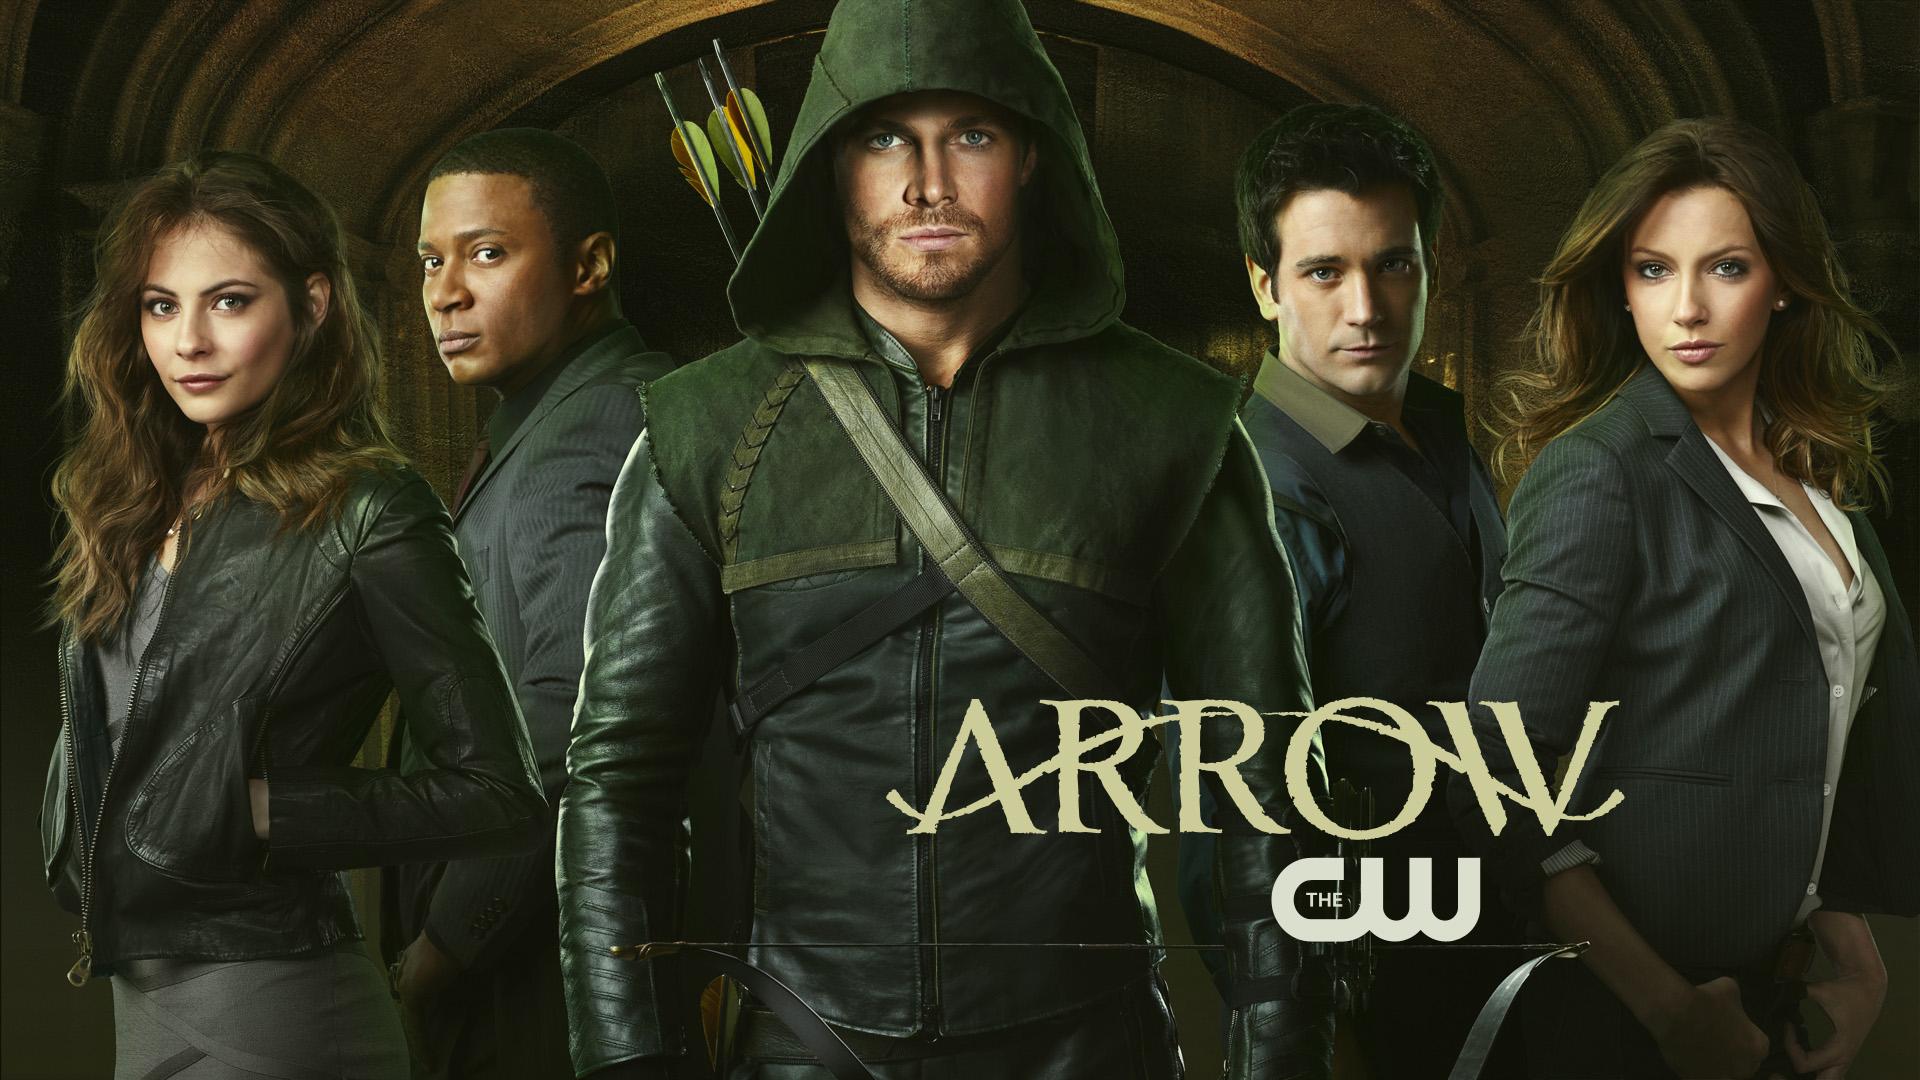 Arrow CW TV Show Wallpapers HD Wallpapers 1920x1080